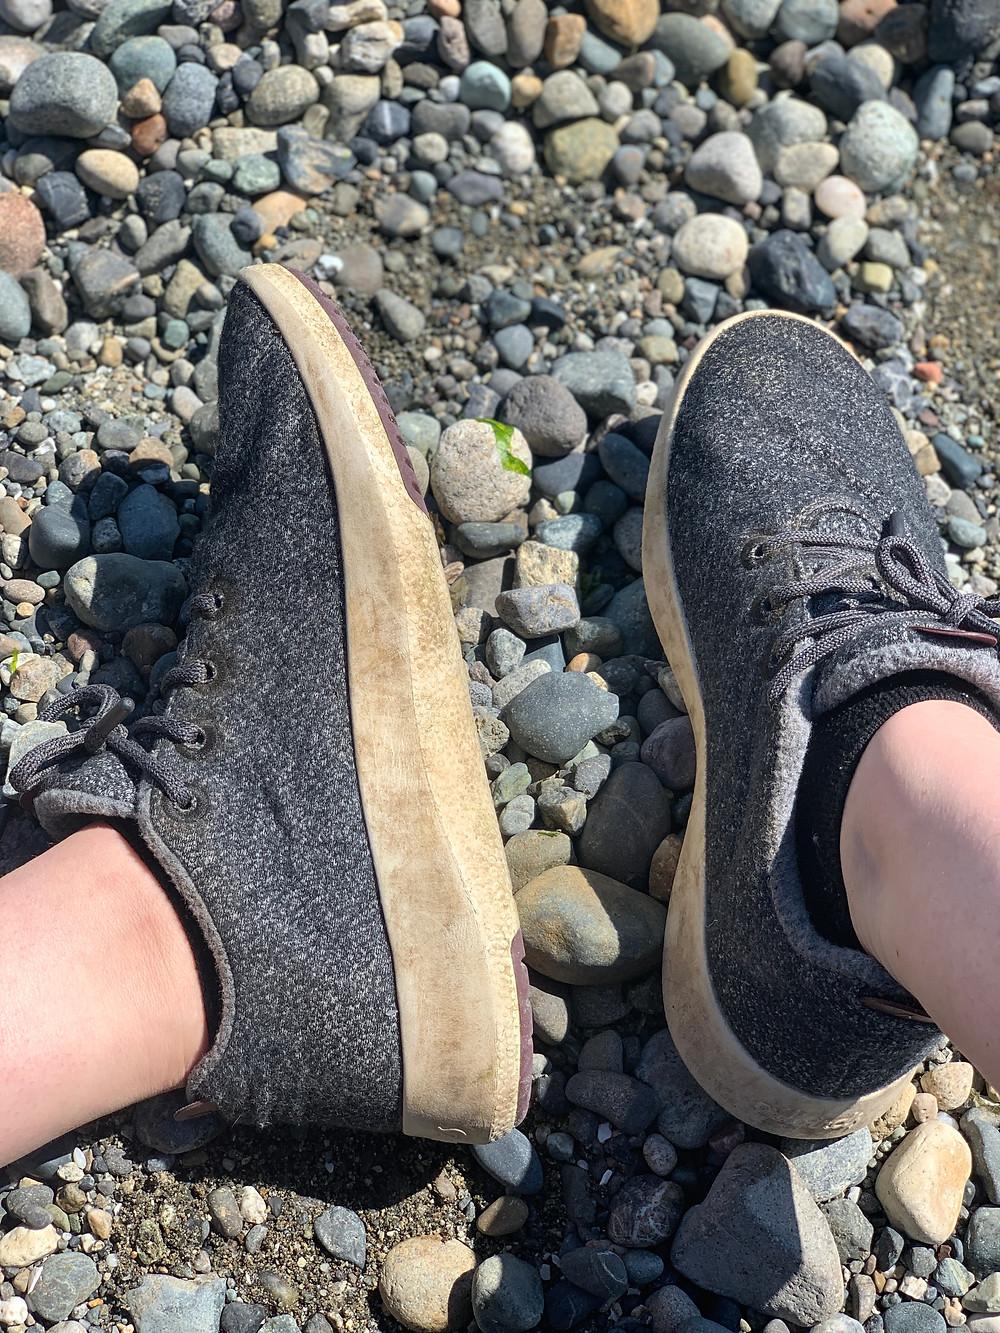 Allbirds sustainable sneakers slightly dirty